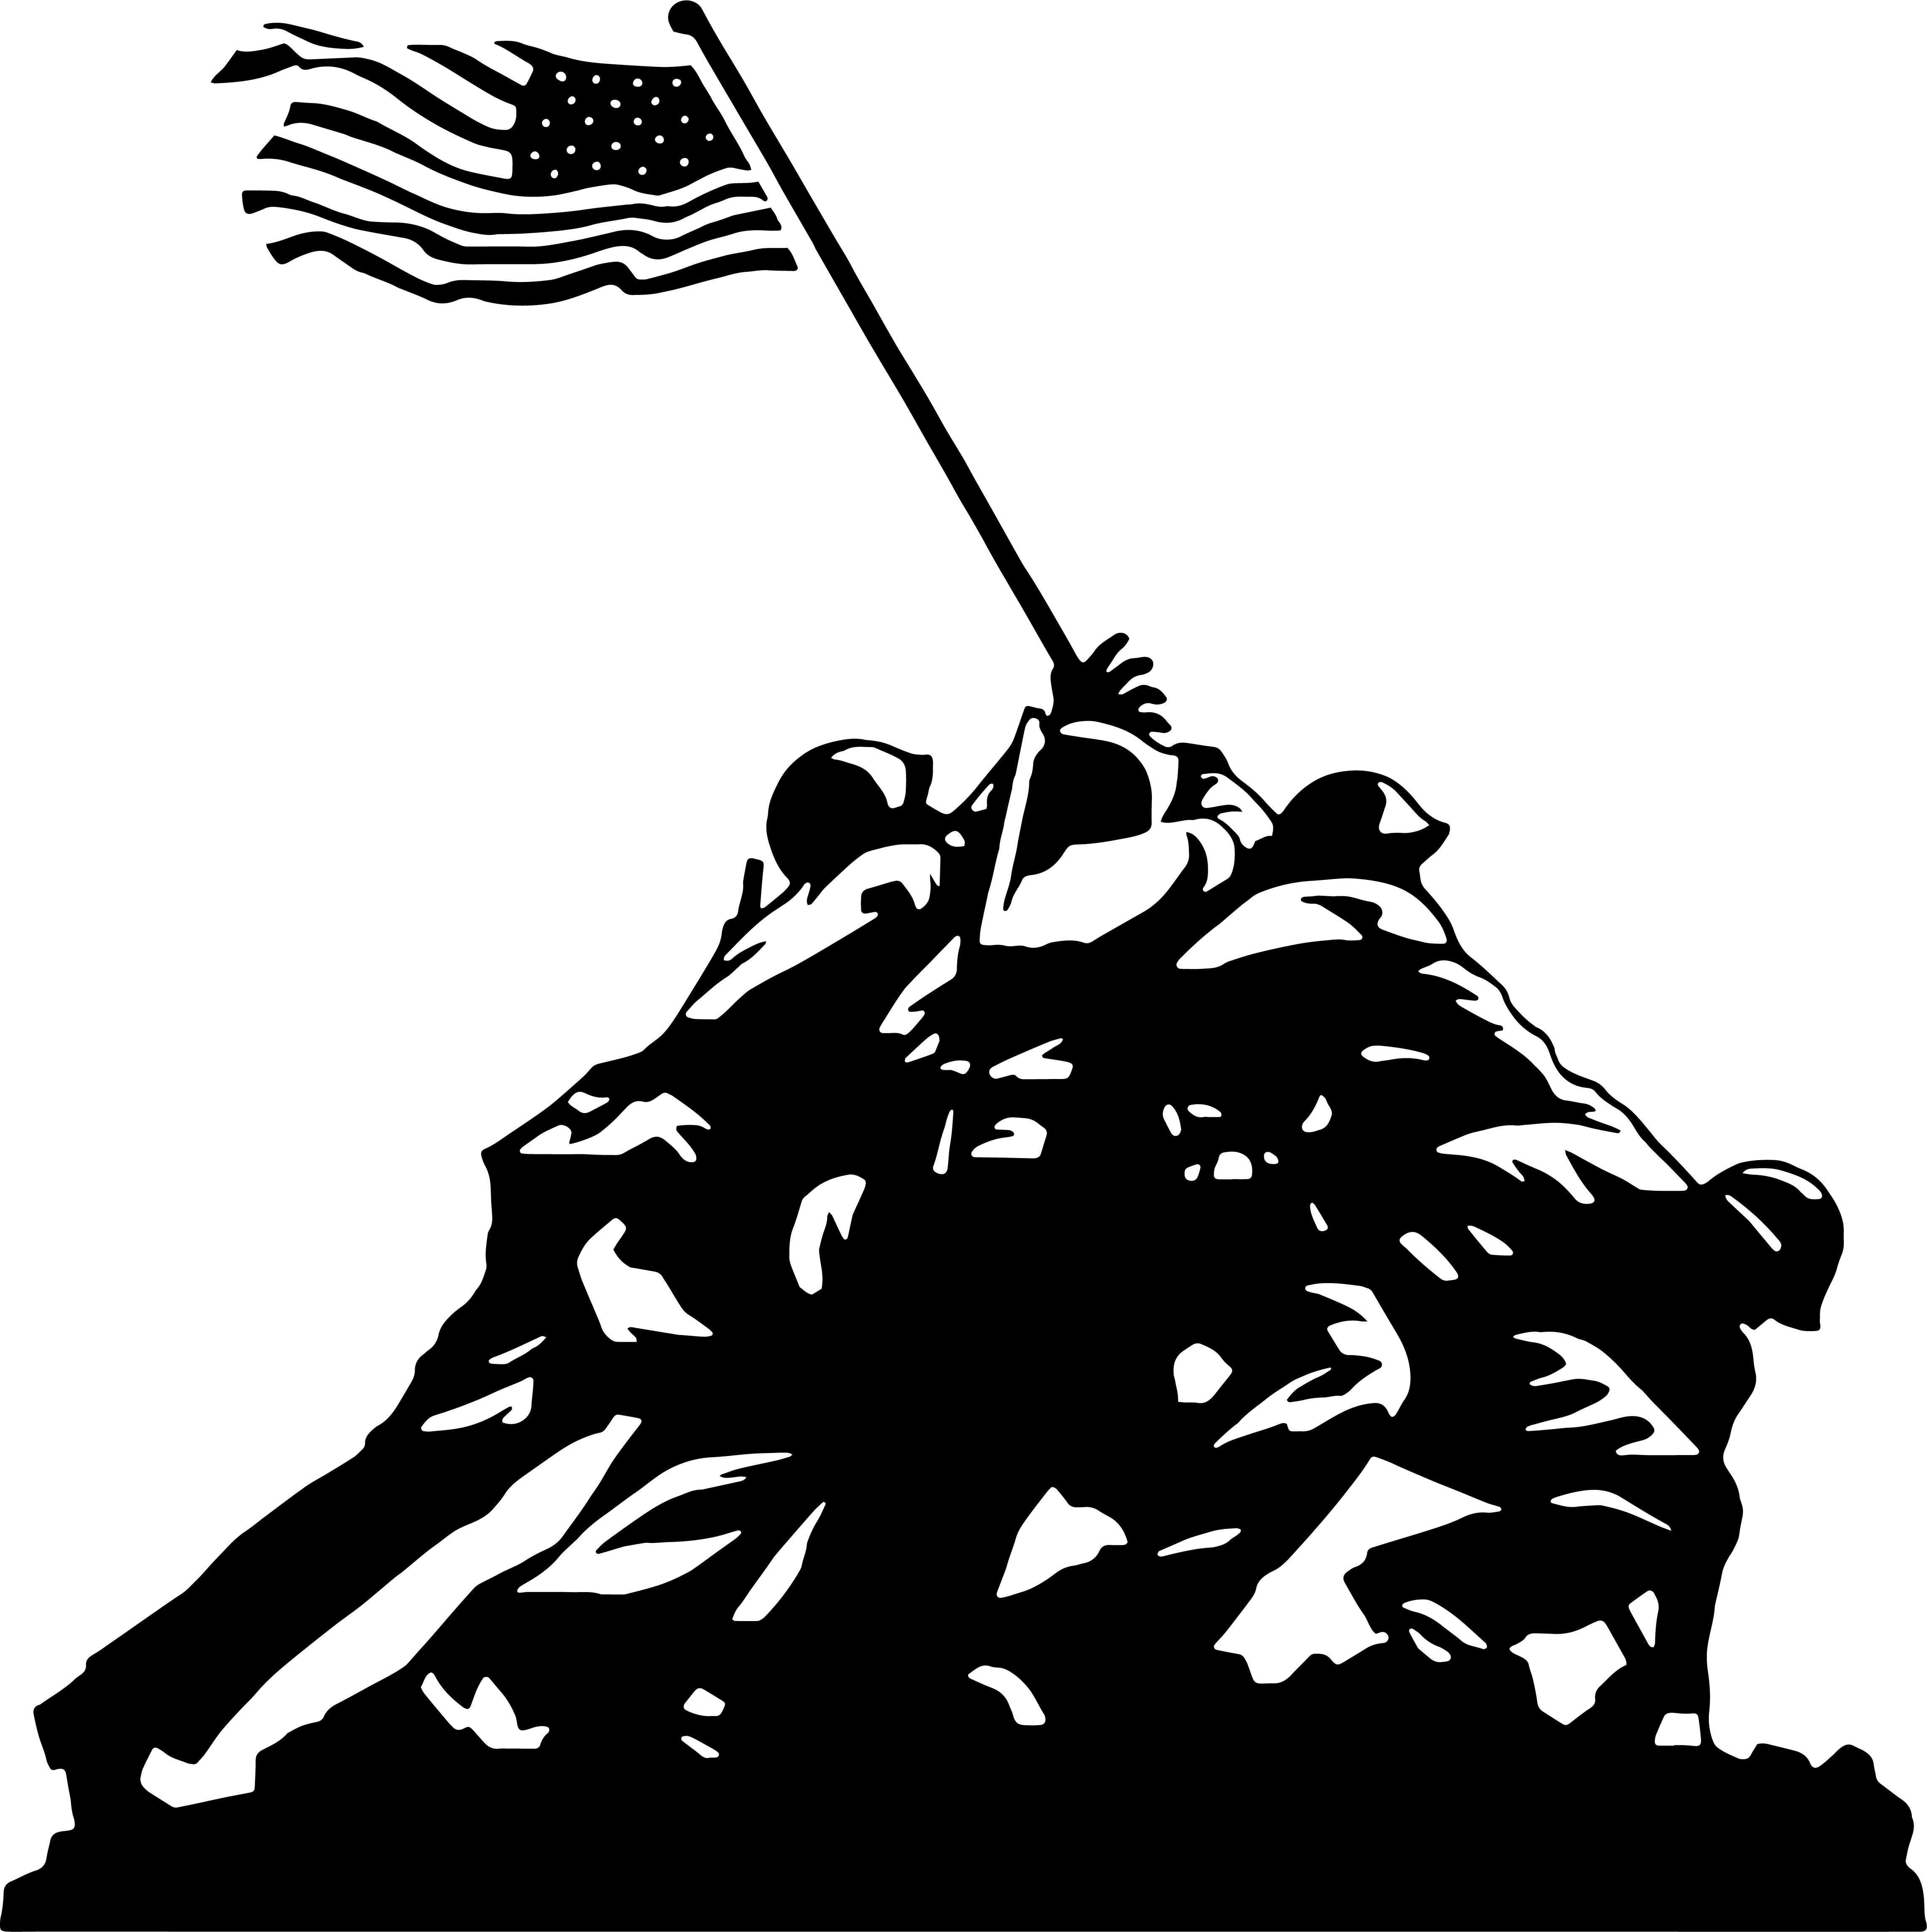 Iwo jima flag raising clipart image free library Iwo Jima Flag Raising – Decal image free library